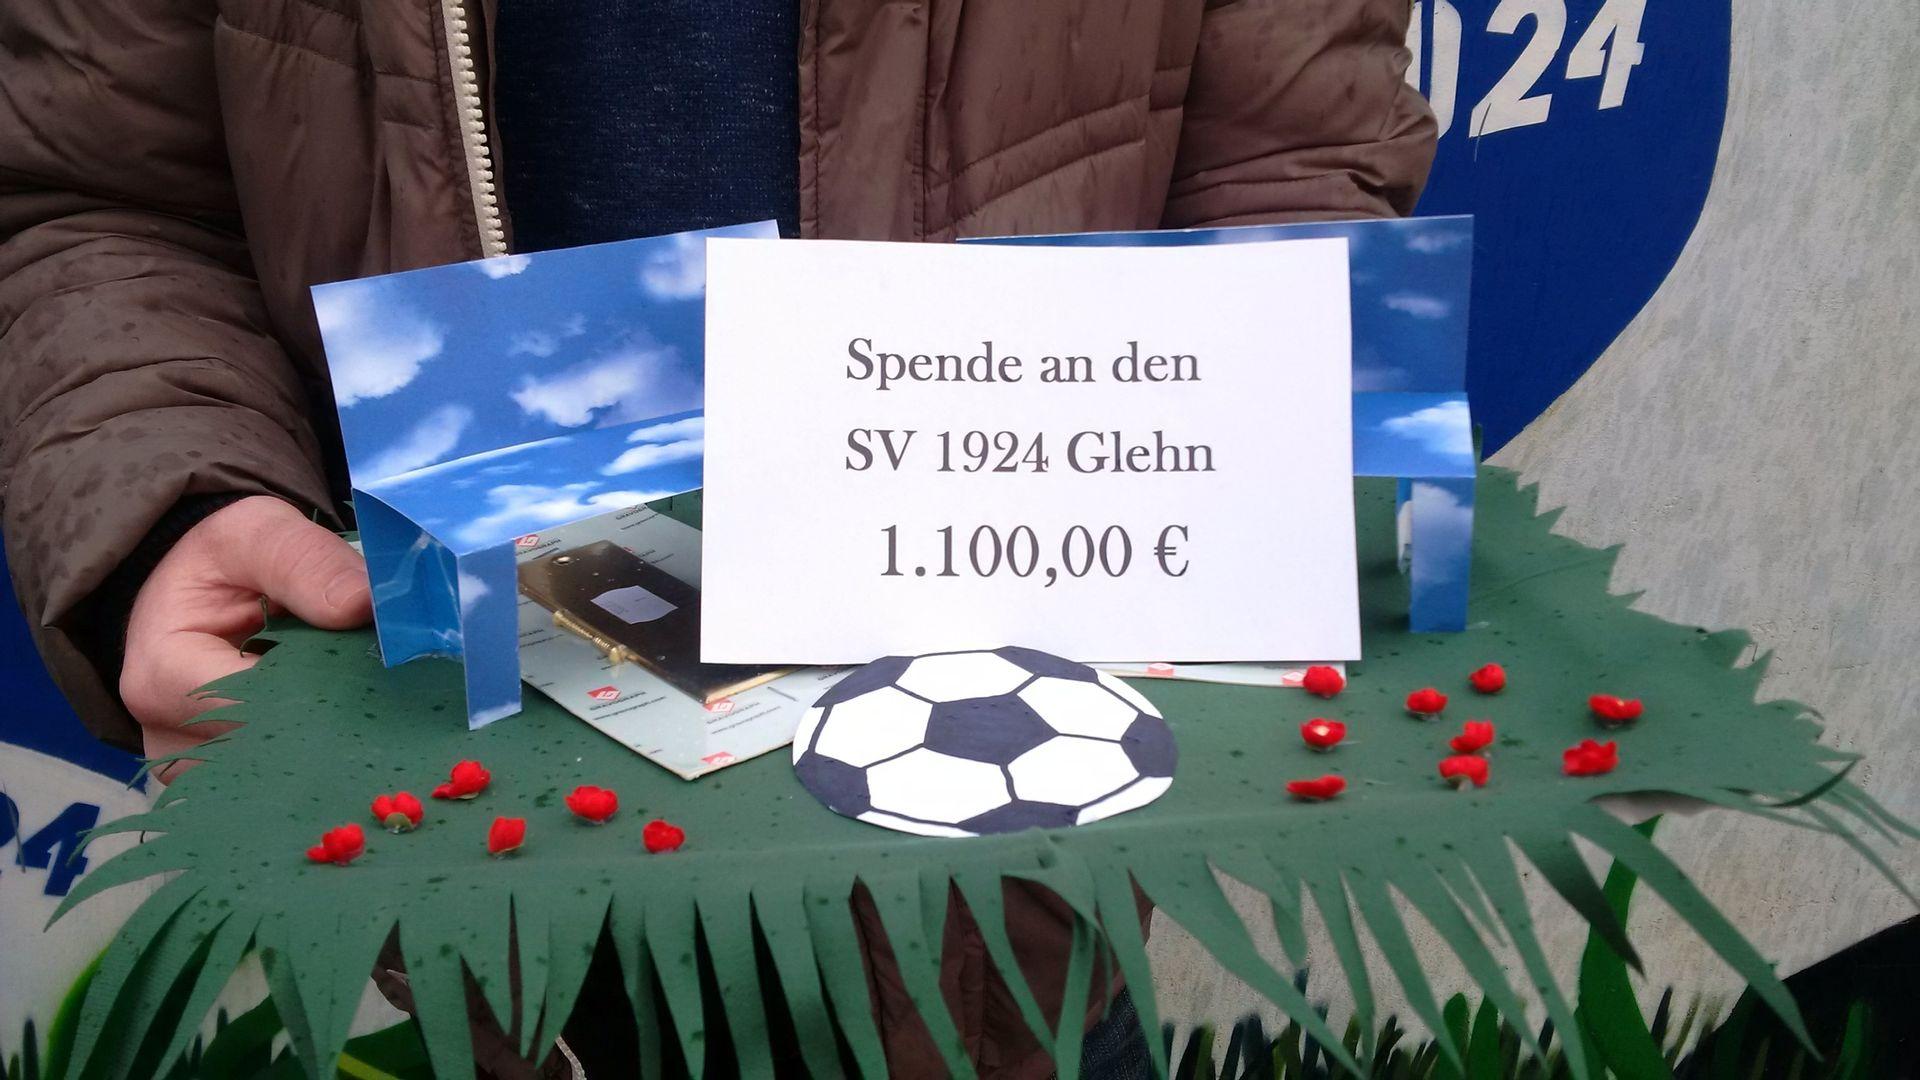 Das Spendenkonto | SV 1924 Glehn e.V.